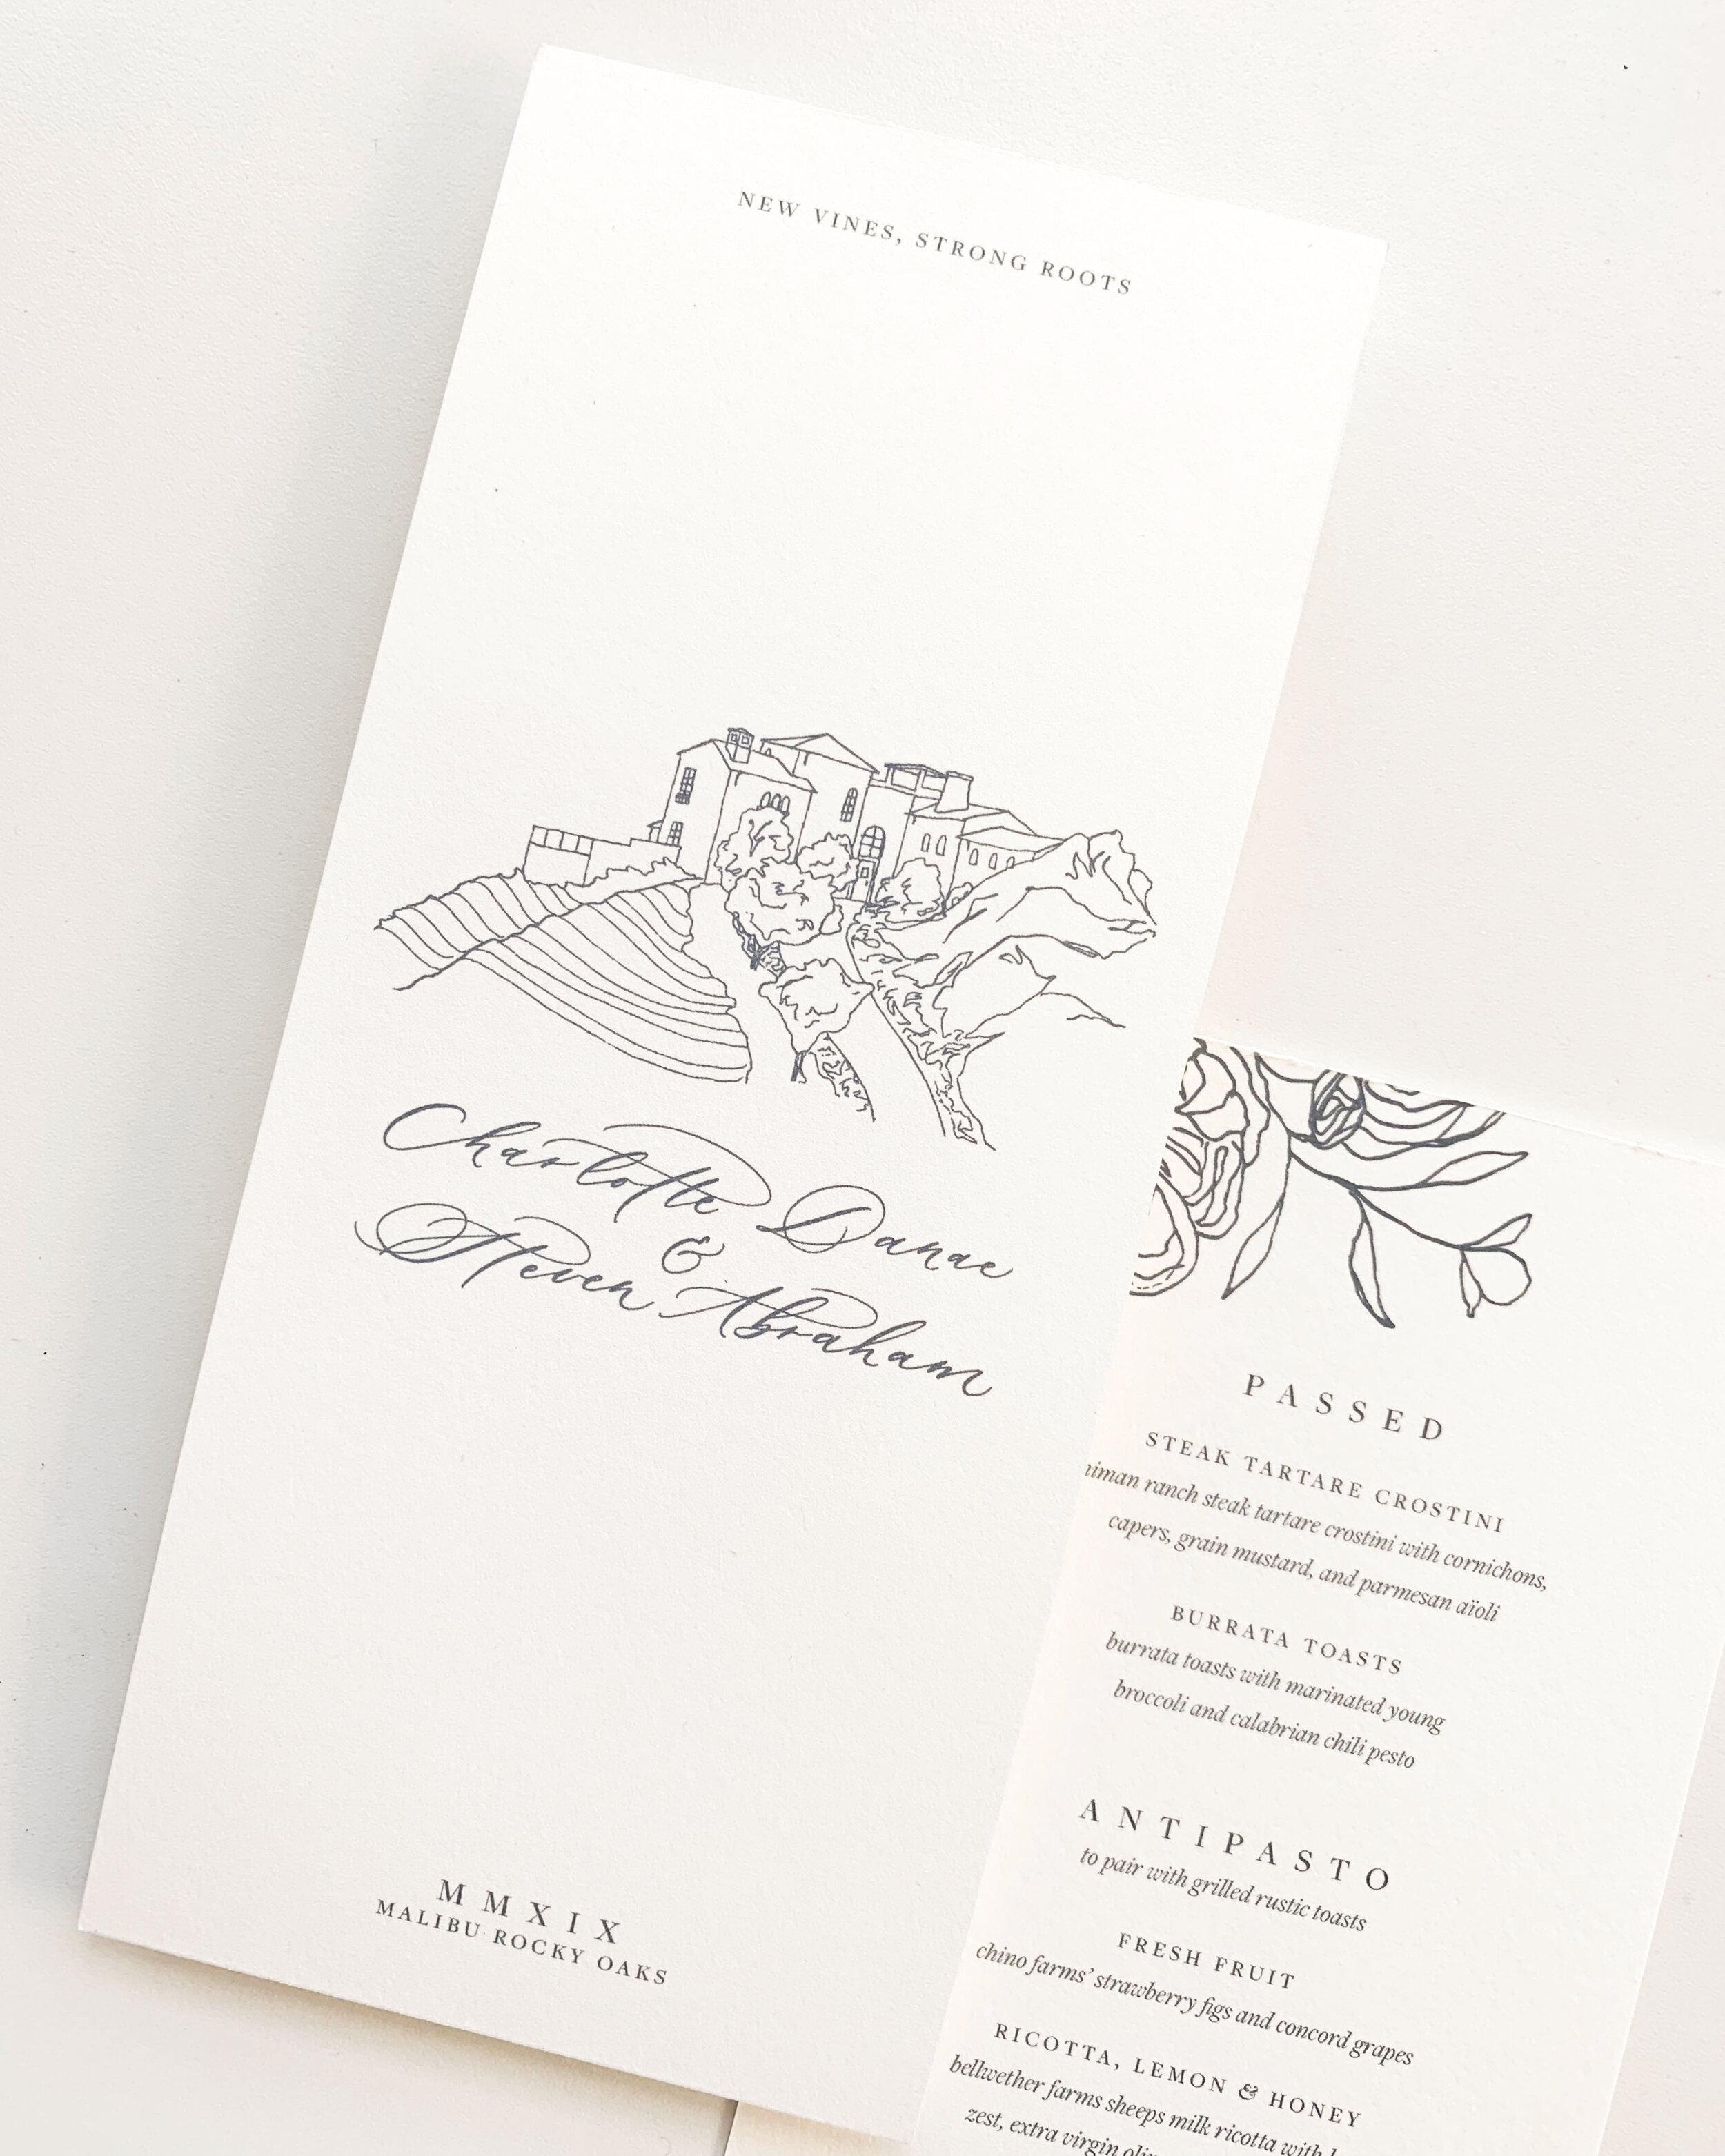 Spring wedding invitations Malibu California. Malibu Rocky Oaks venue illustration wedding invitation. Floral wedding invitation. Blue and cream wedding invitation. Fine art calligraphy blue wedding invitation.